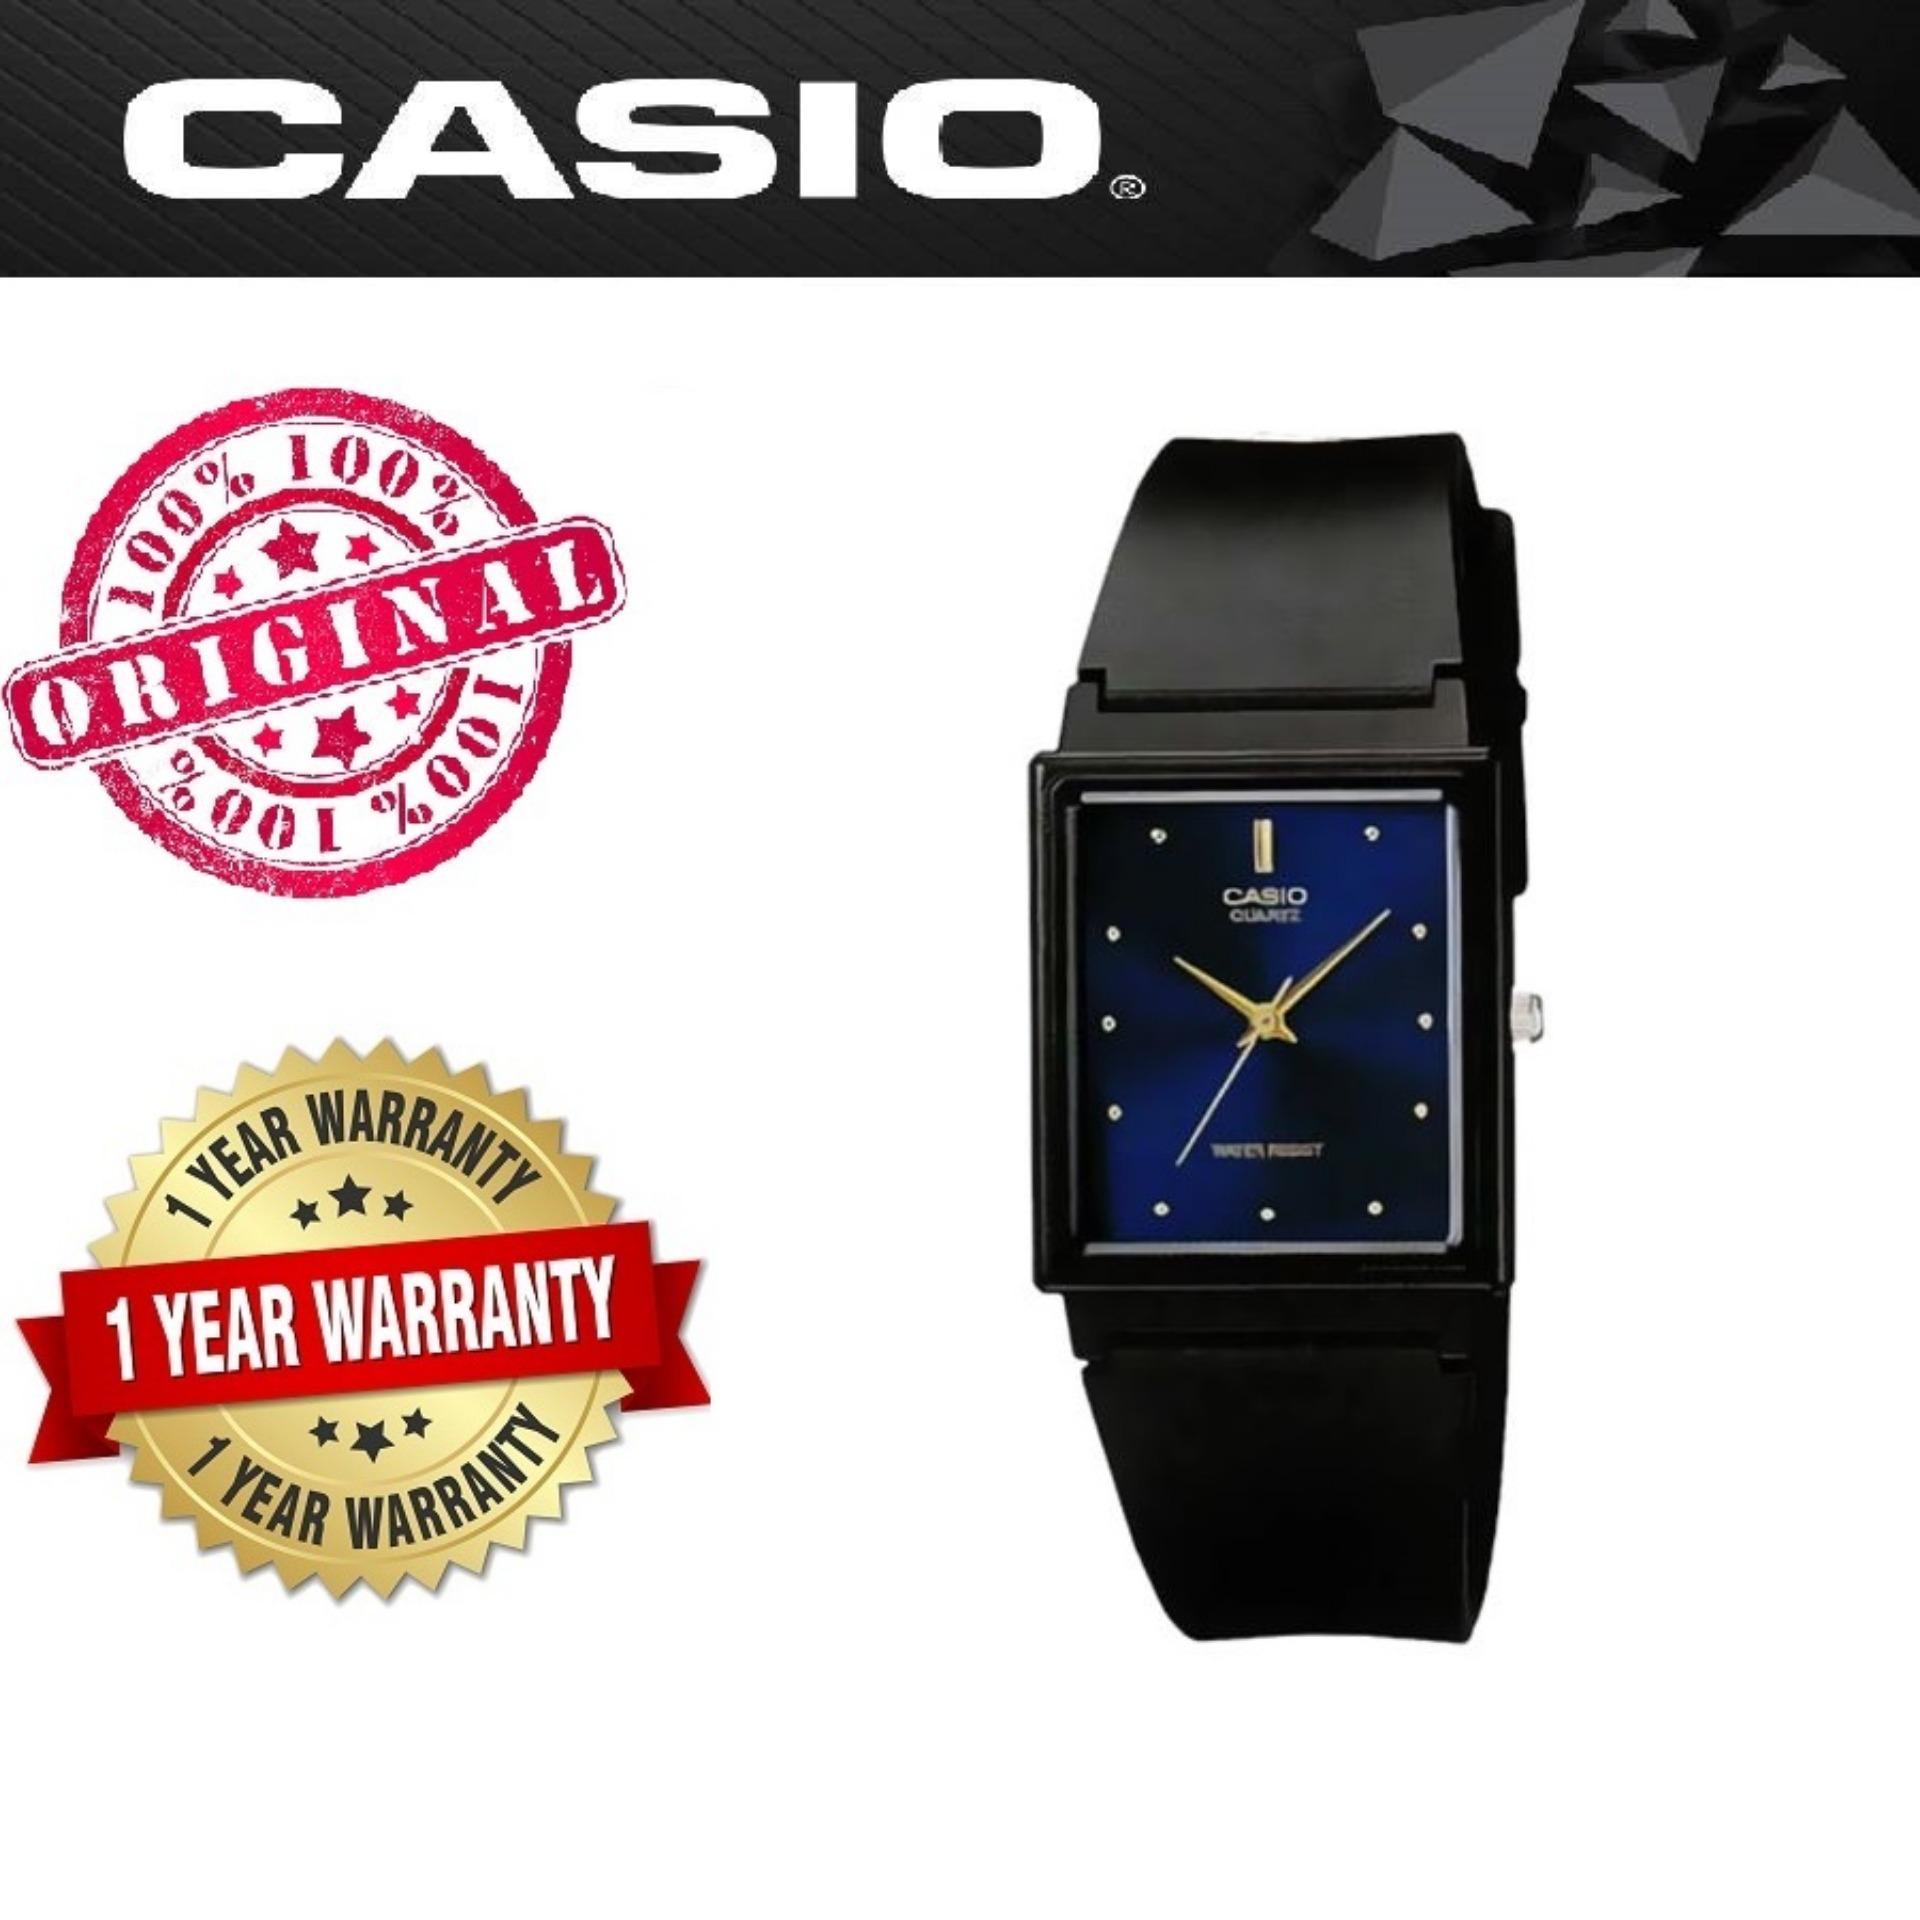 Casio Mq 38 7adf Mens Quartzwatch Black Silver Without Box Intl Standard Mw 240 3b Jam Tangan Pria Green Strap Rubber 2adf Watch